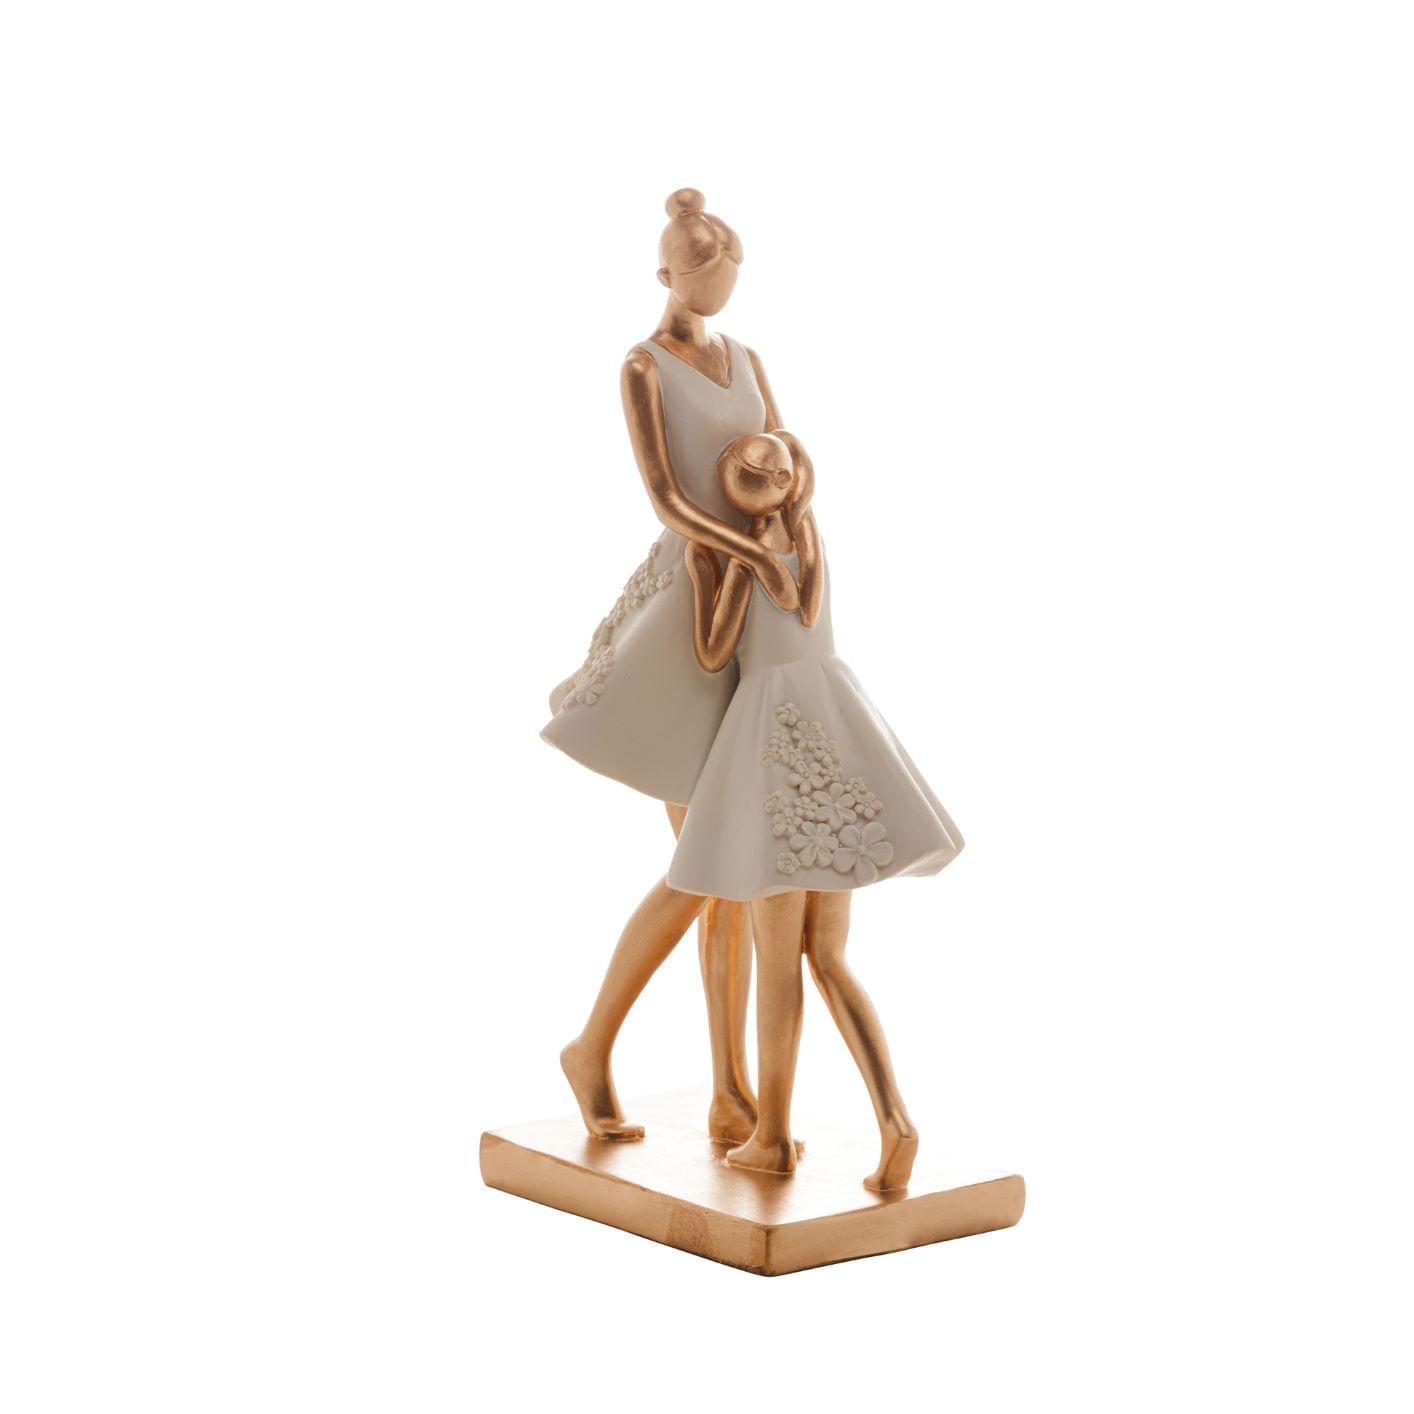 Escultura Decorativa Família: Mãe e Filha Se Abraçando